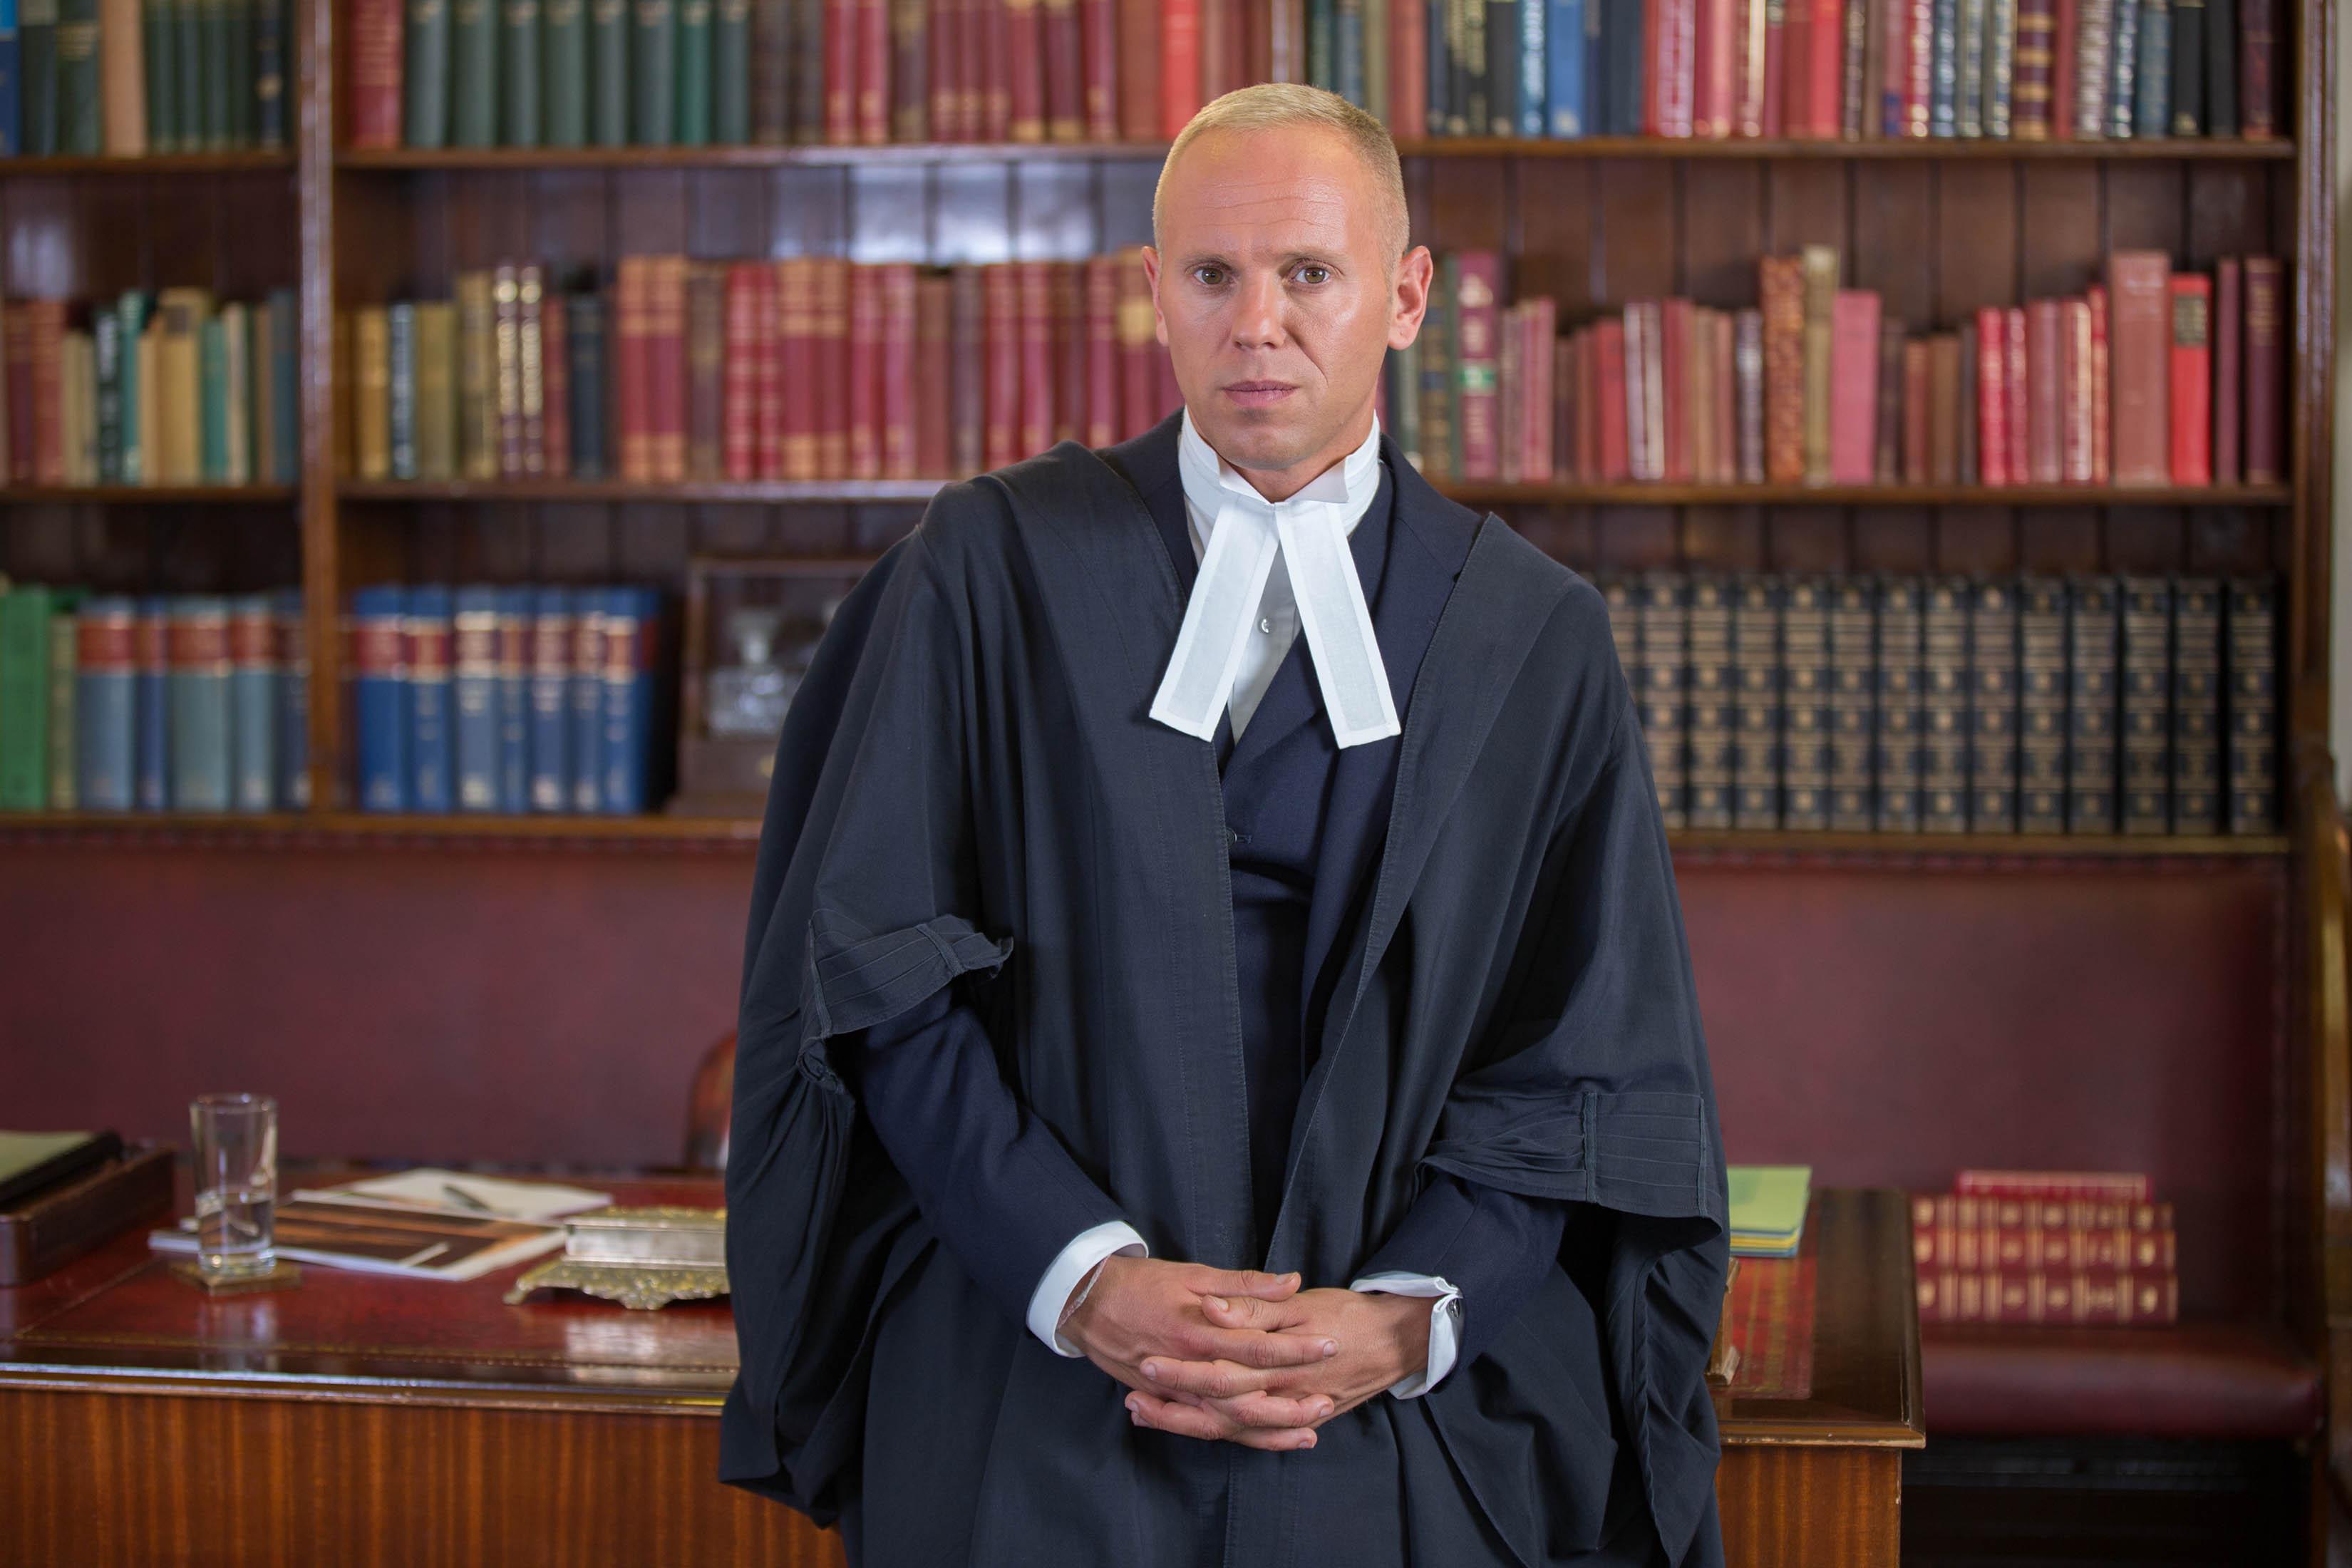 Judge Rinder separates from his partner of 11 years Seth Cummings